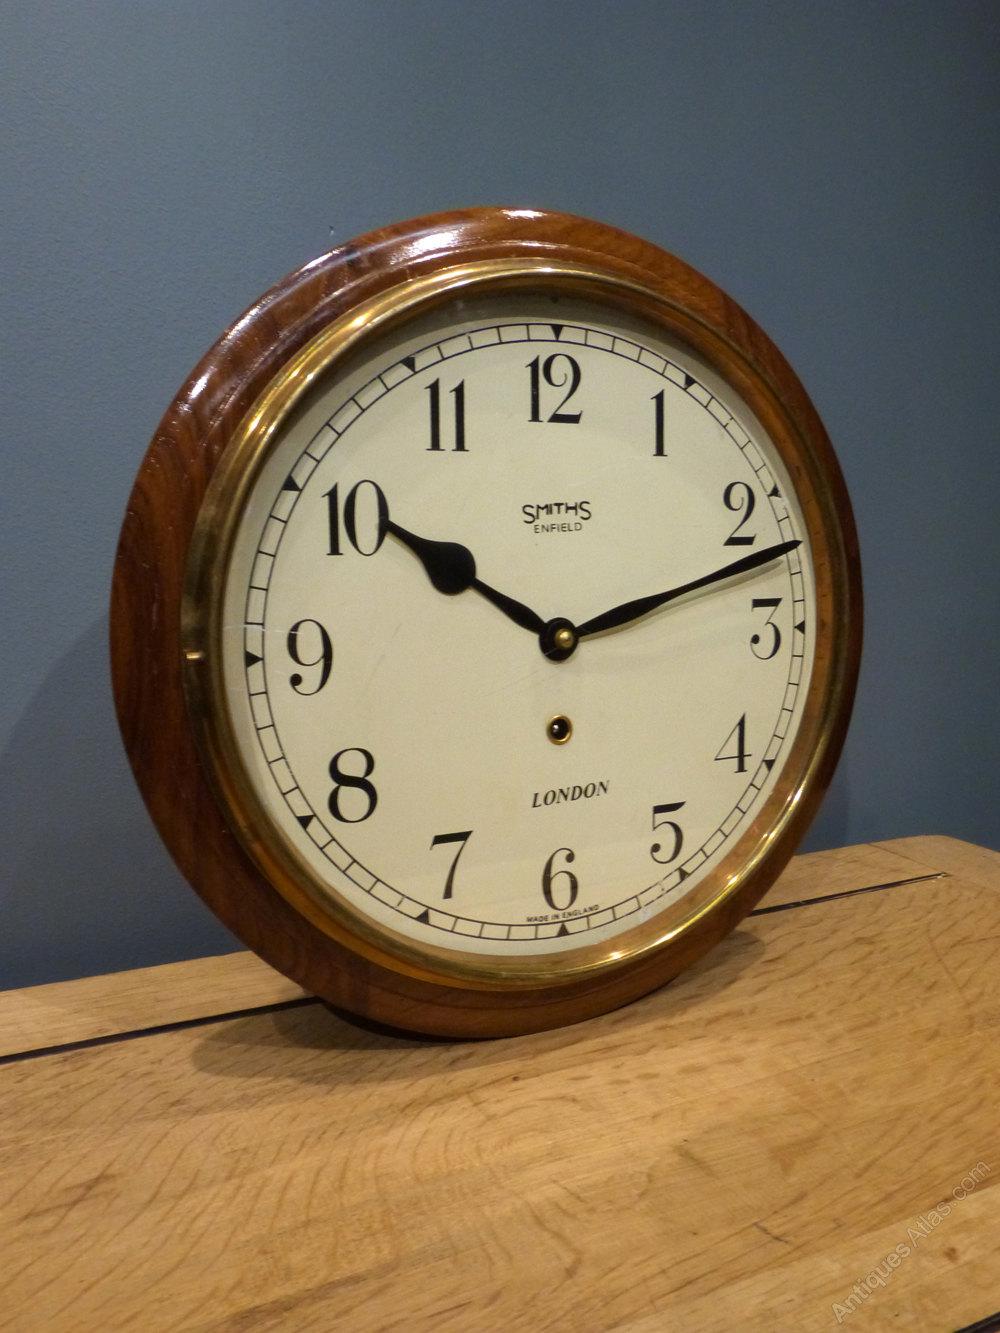 Antiques atlas smiths enfield railway clock smiths enfield railway clock antique station wall clocks smiths smith wall clock amipublicfo Gallery